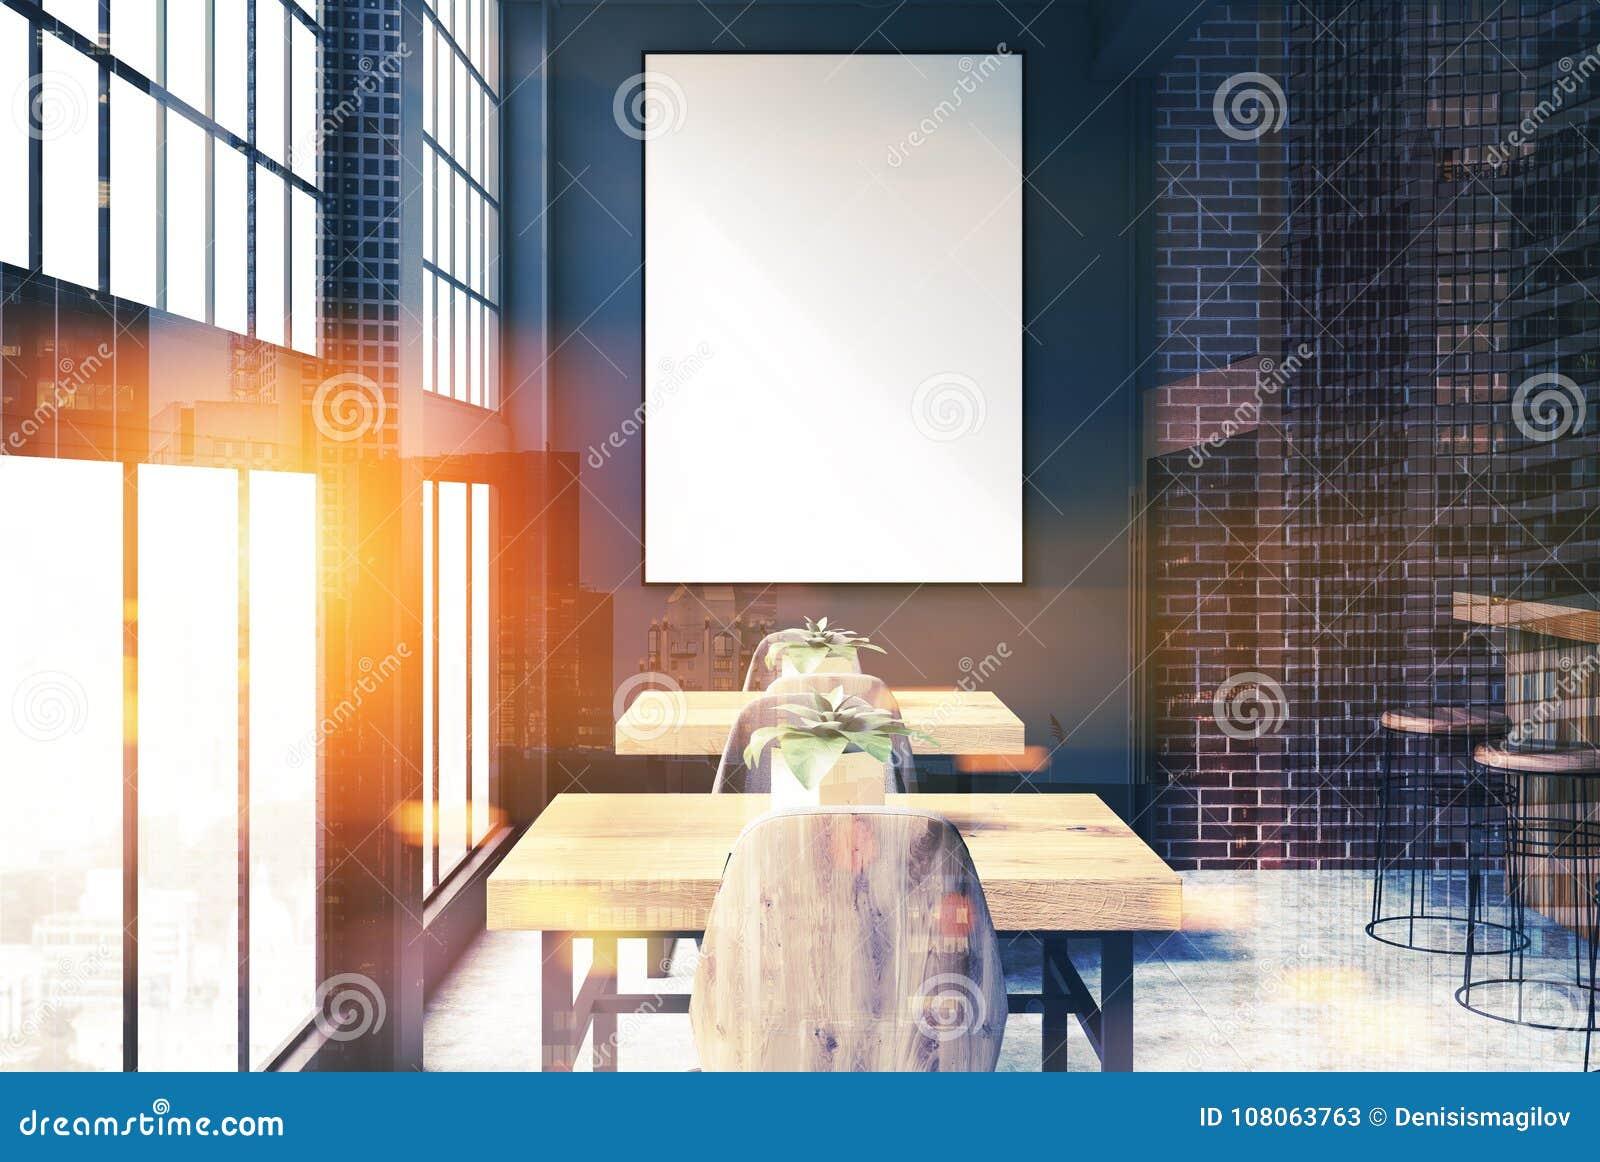 Black And Brick Bar Interior Poster Close Up Toned Stock ...